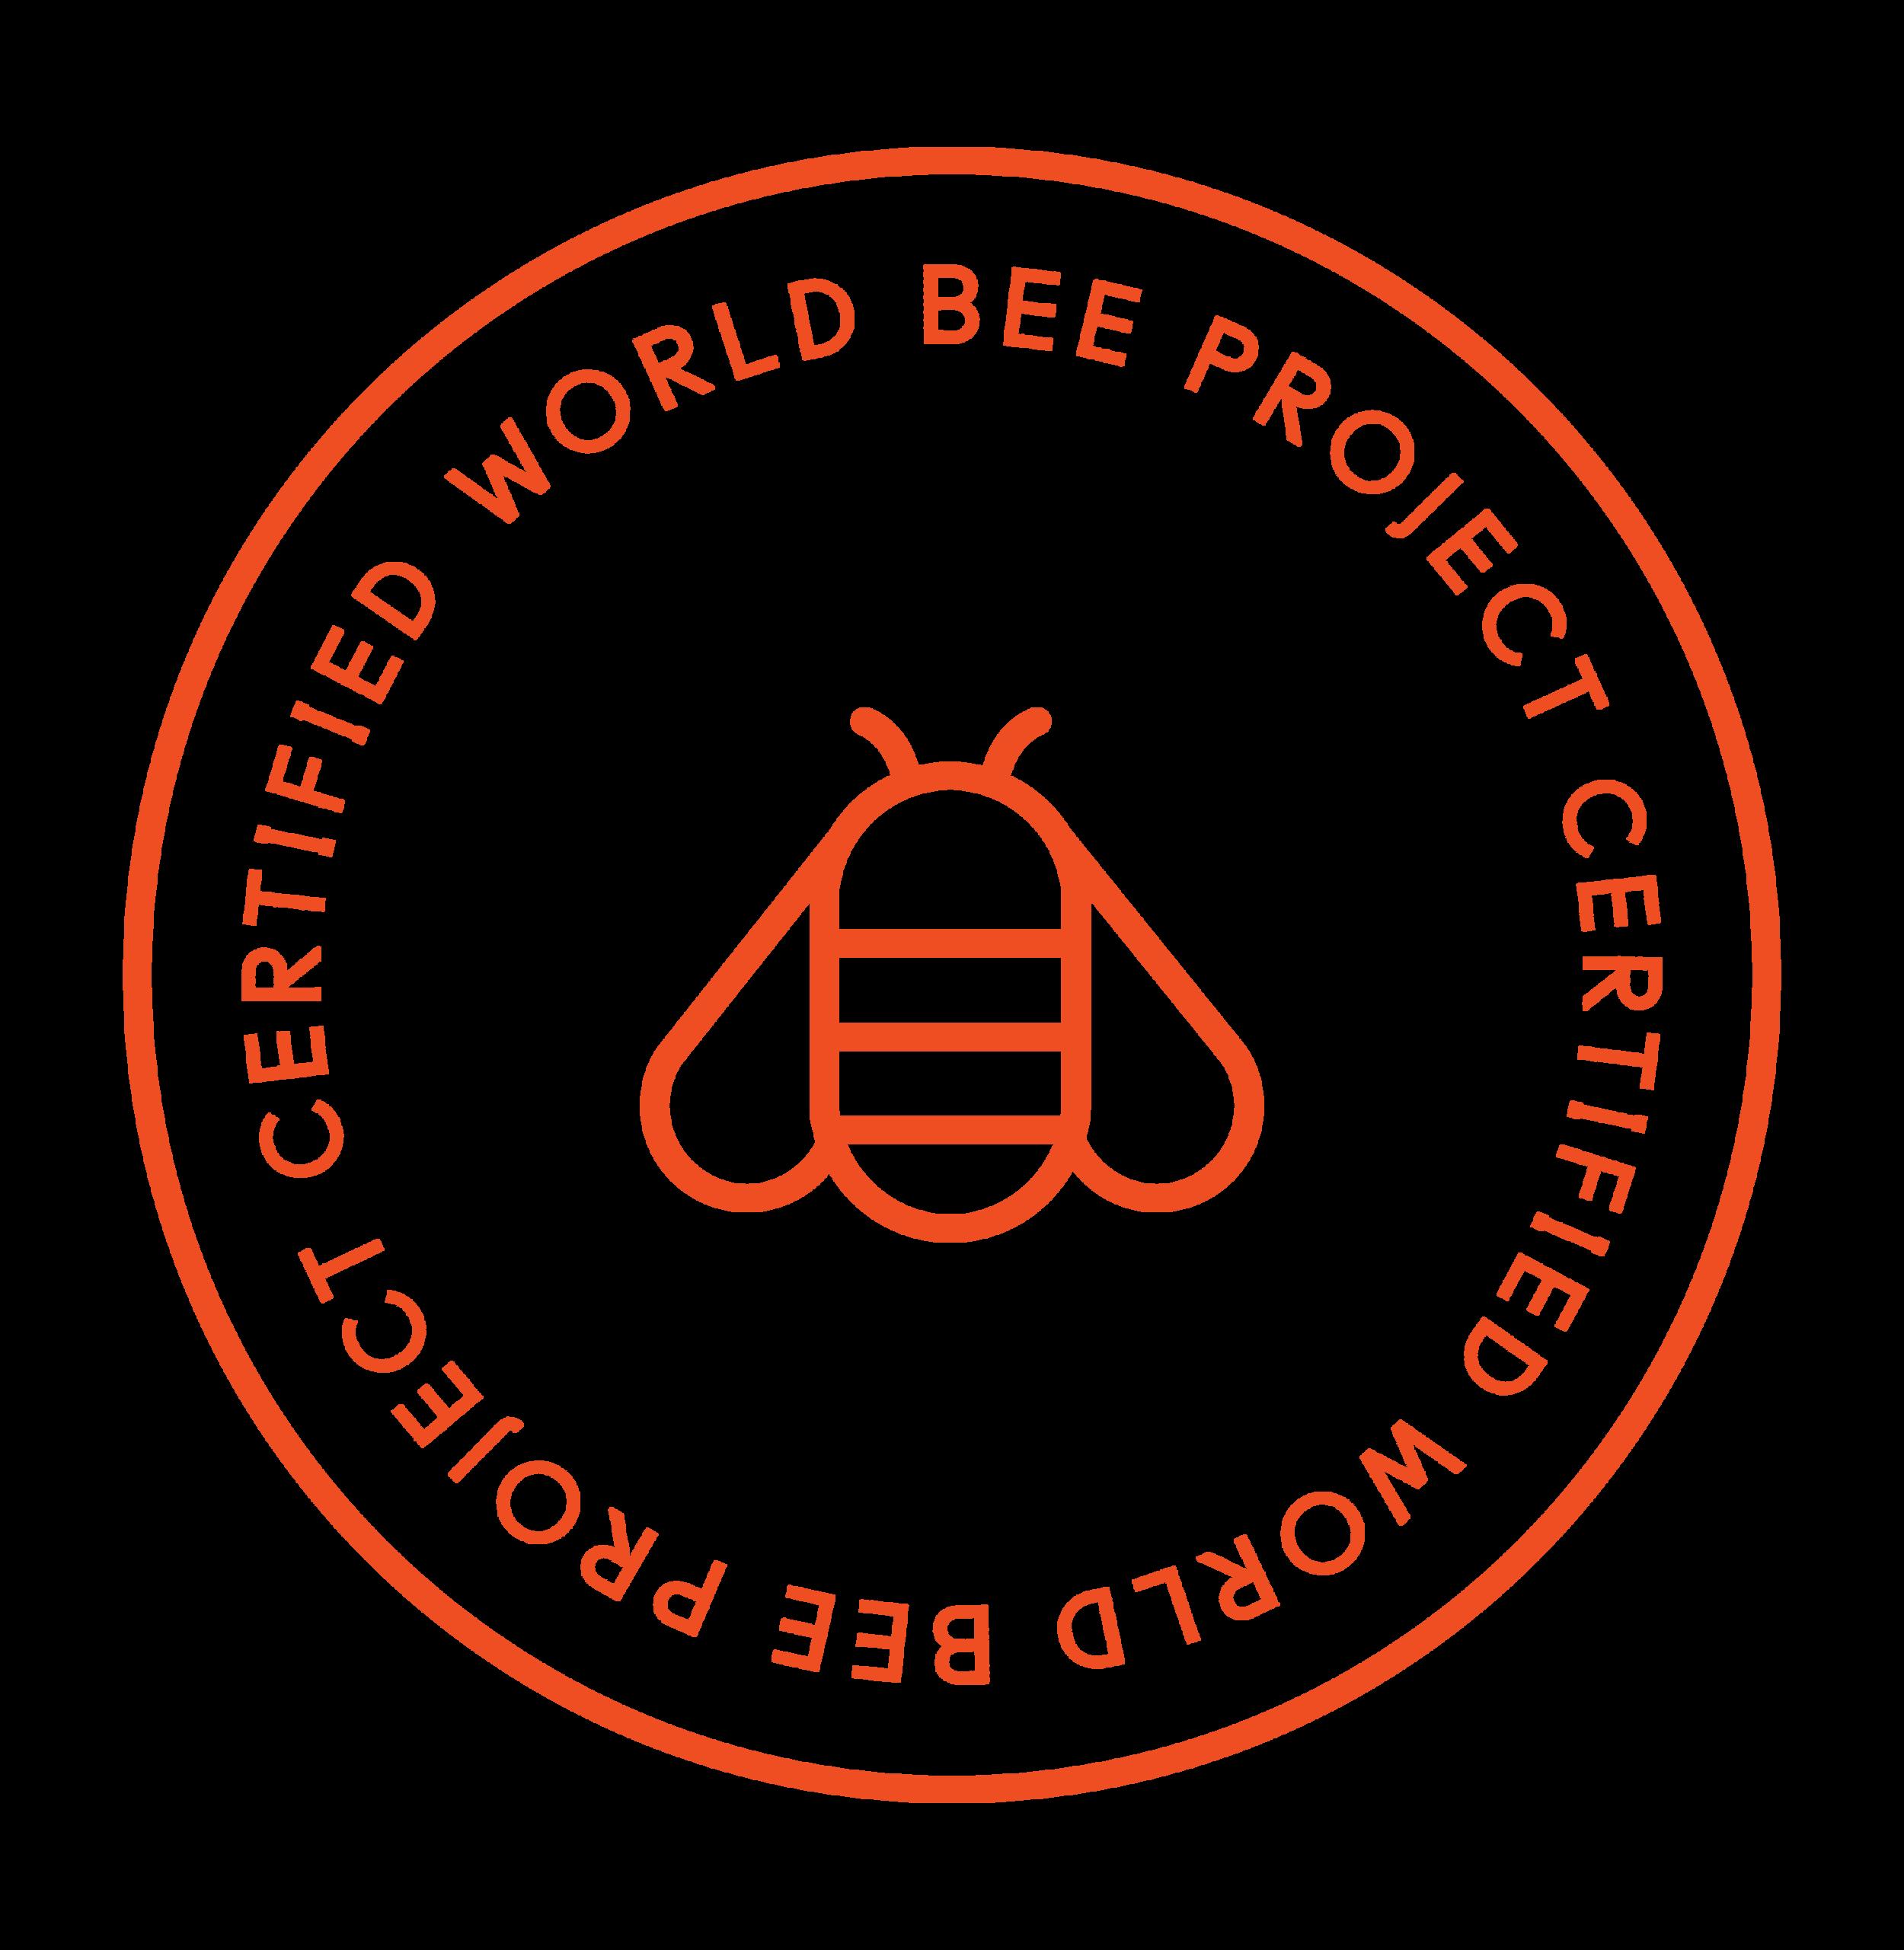 WBP-BeeMark-Orange-Template.png